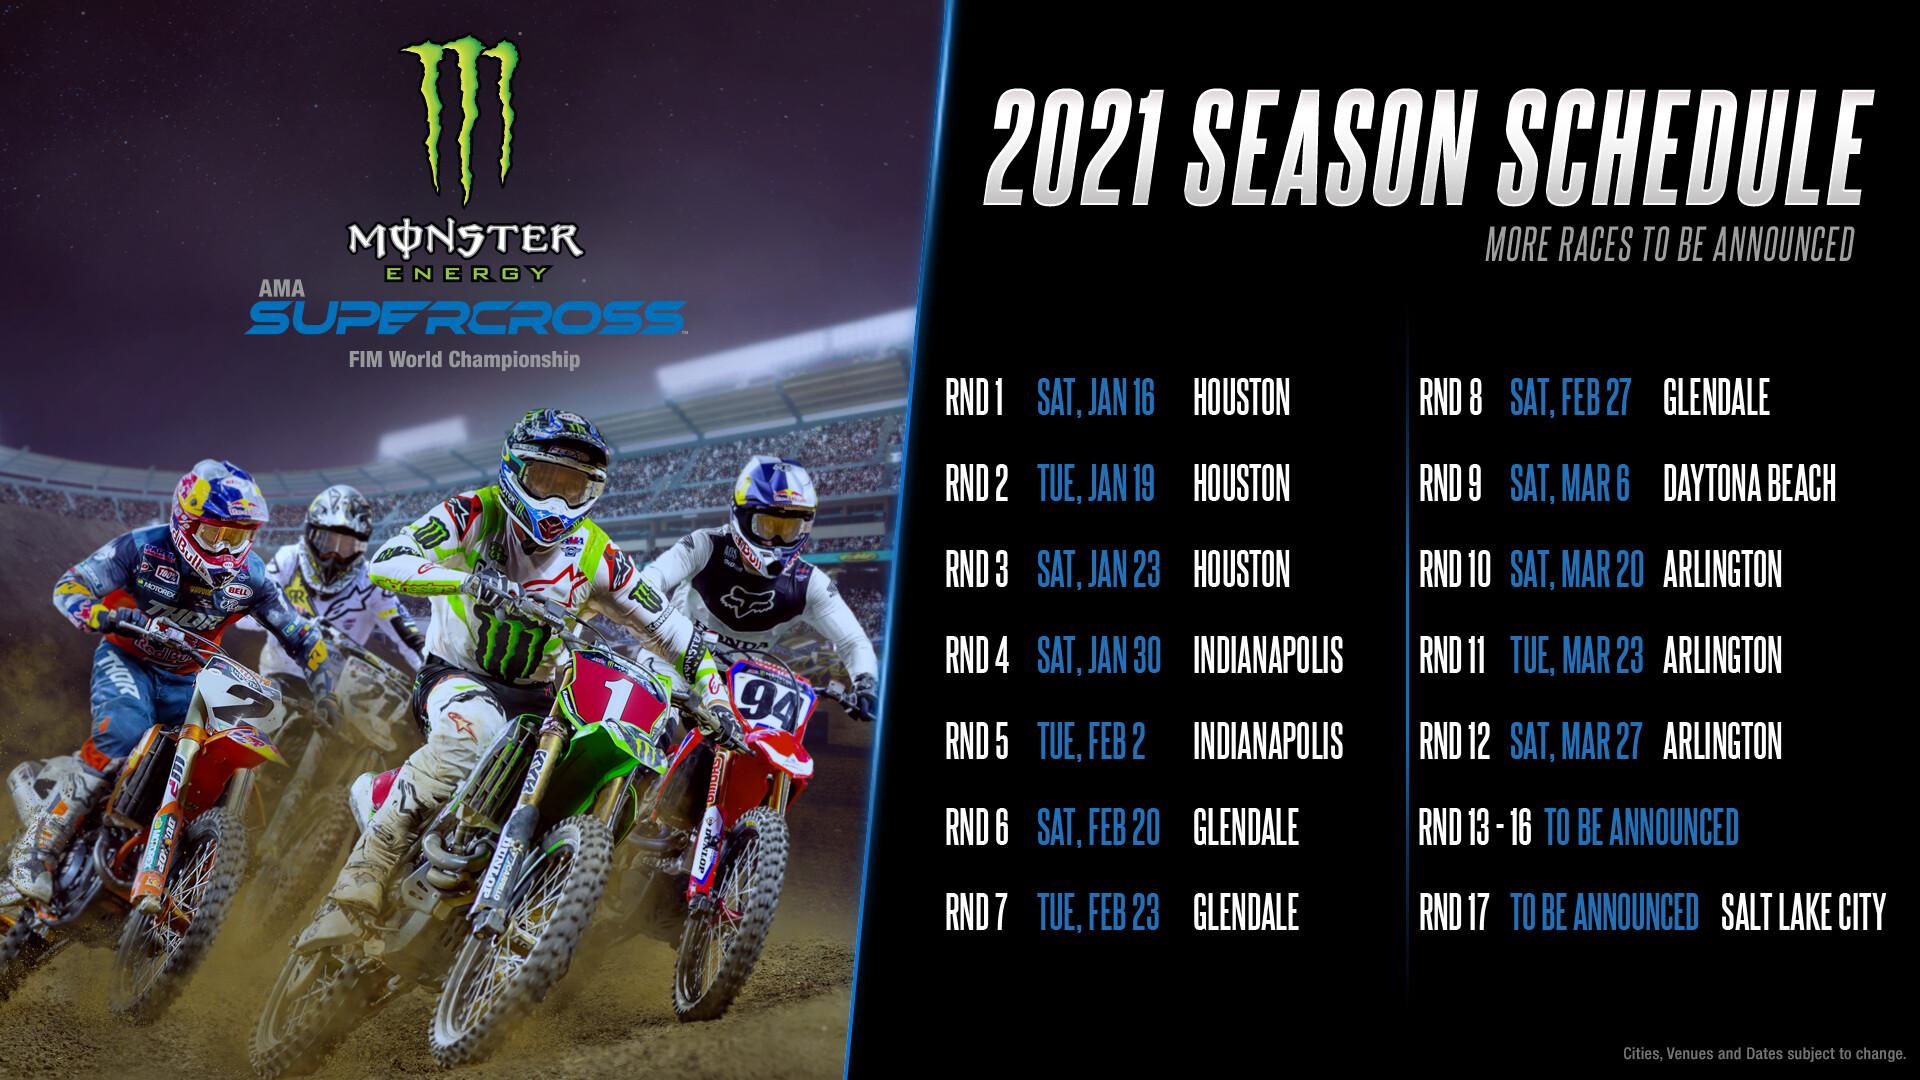 Calendario 2021 Supercross.